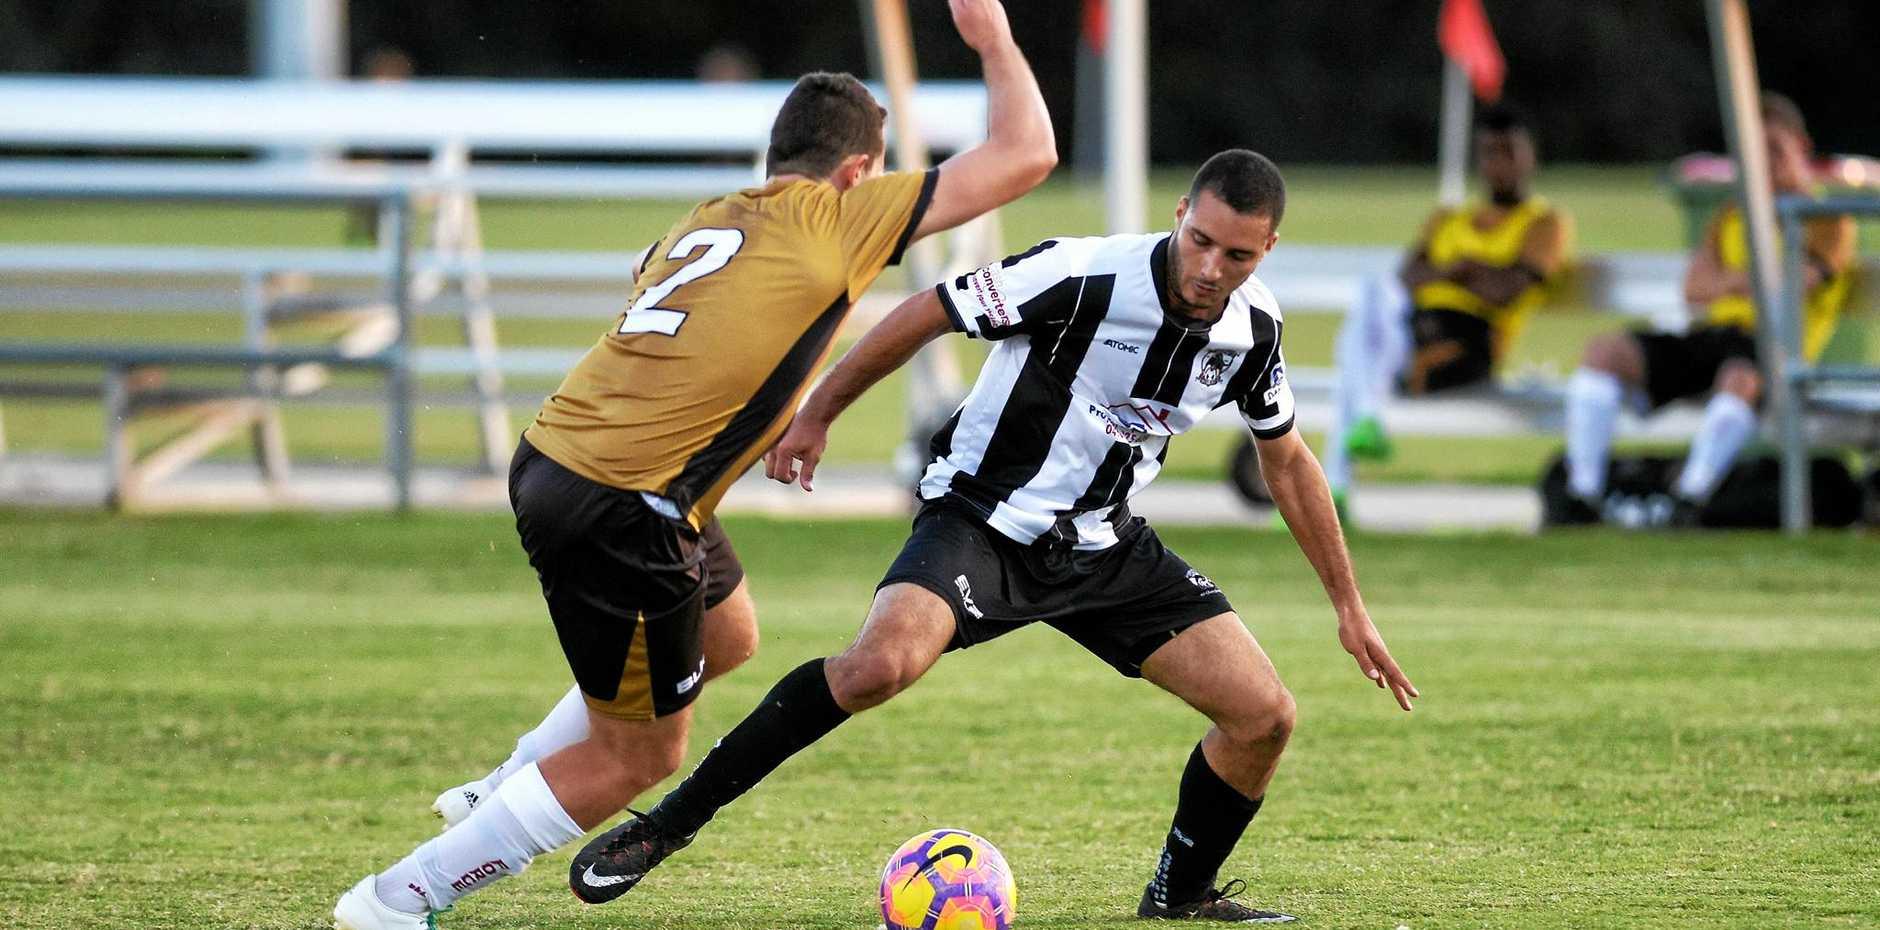 Ipswich City striker and leading goal scorer Ryan Adekoya New (right) battles with a Brisbane Phoenix player.